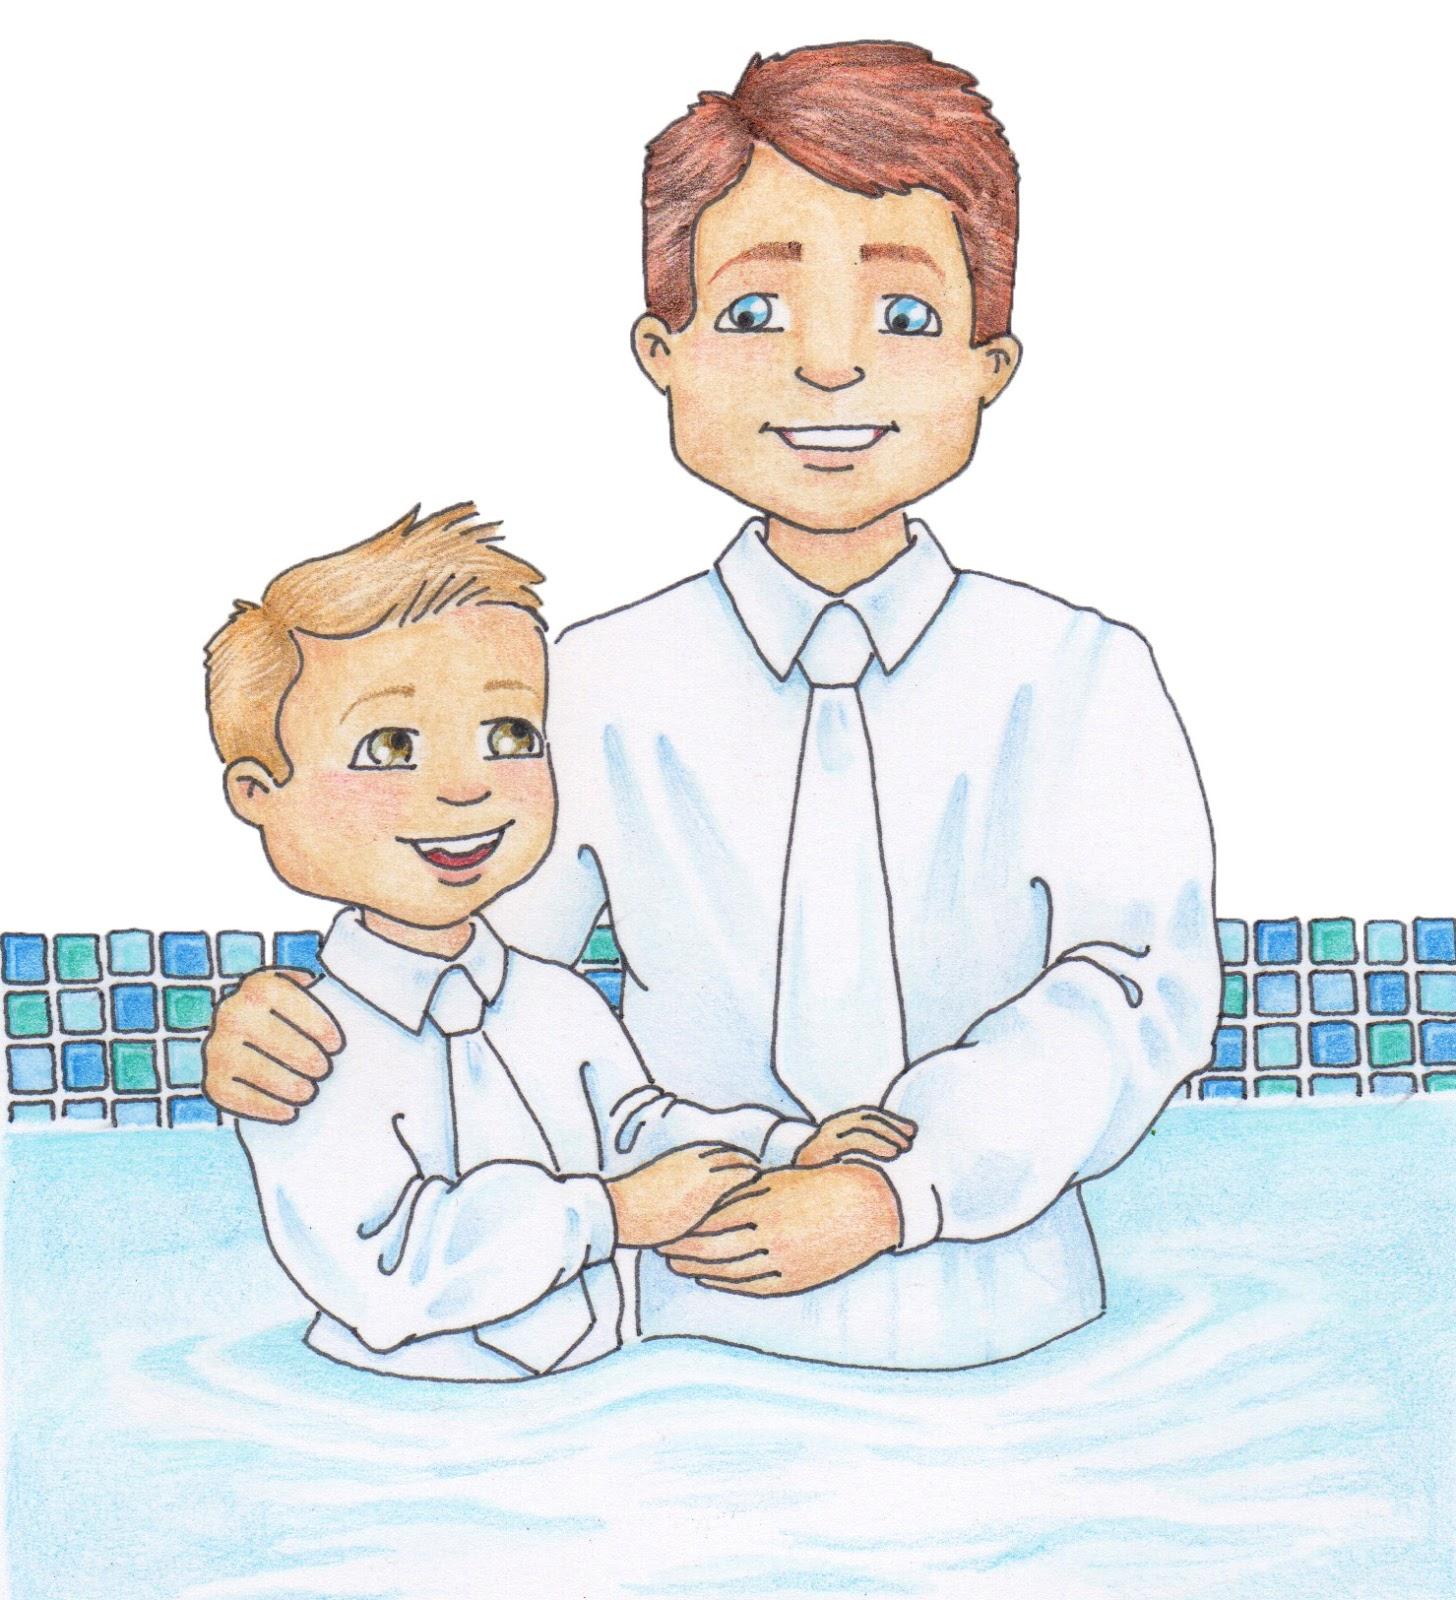 Susan fitch design january. Baptism clipart child baptism